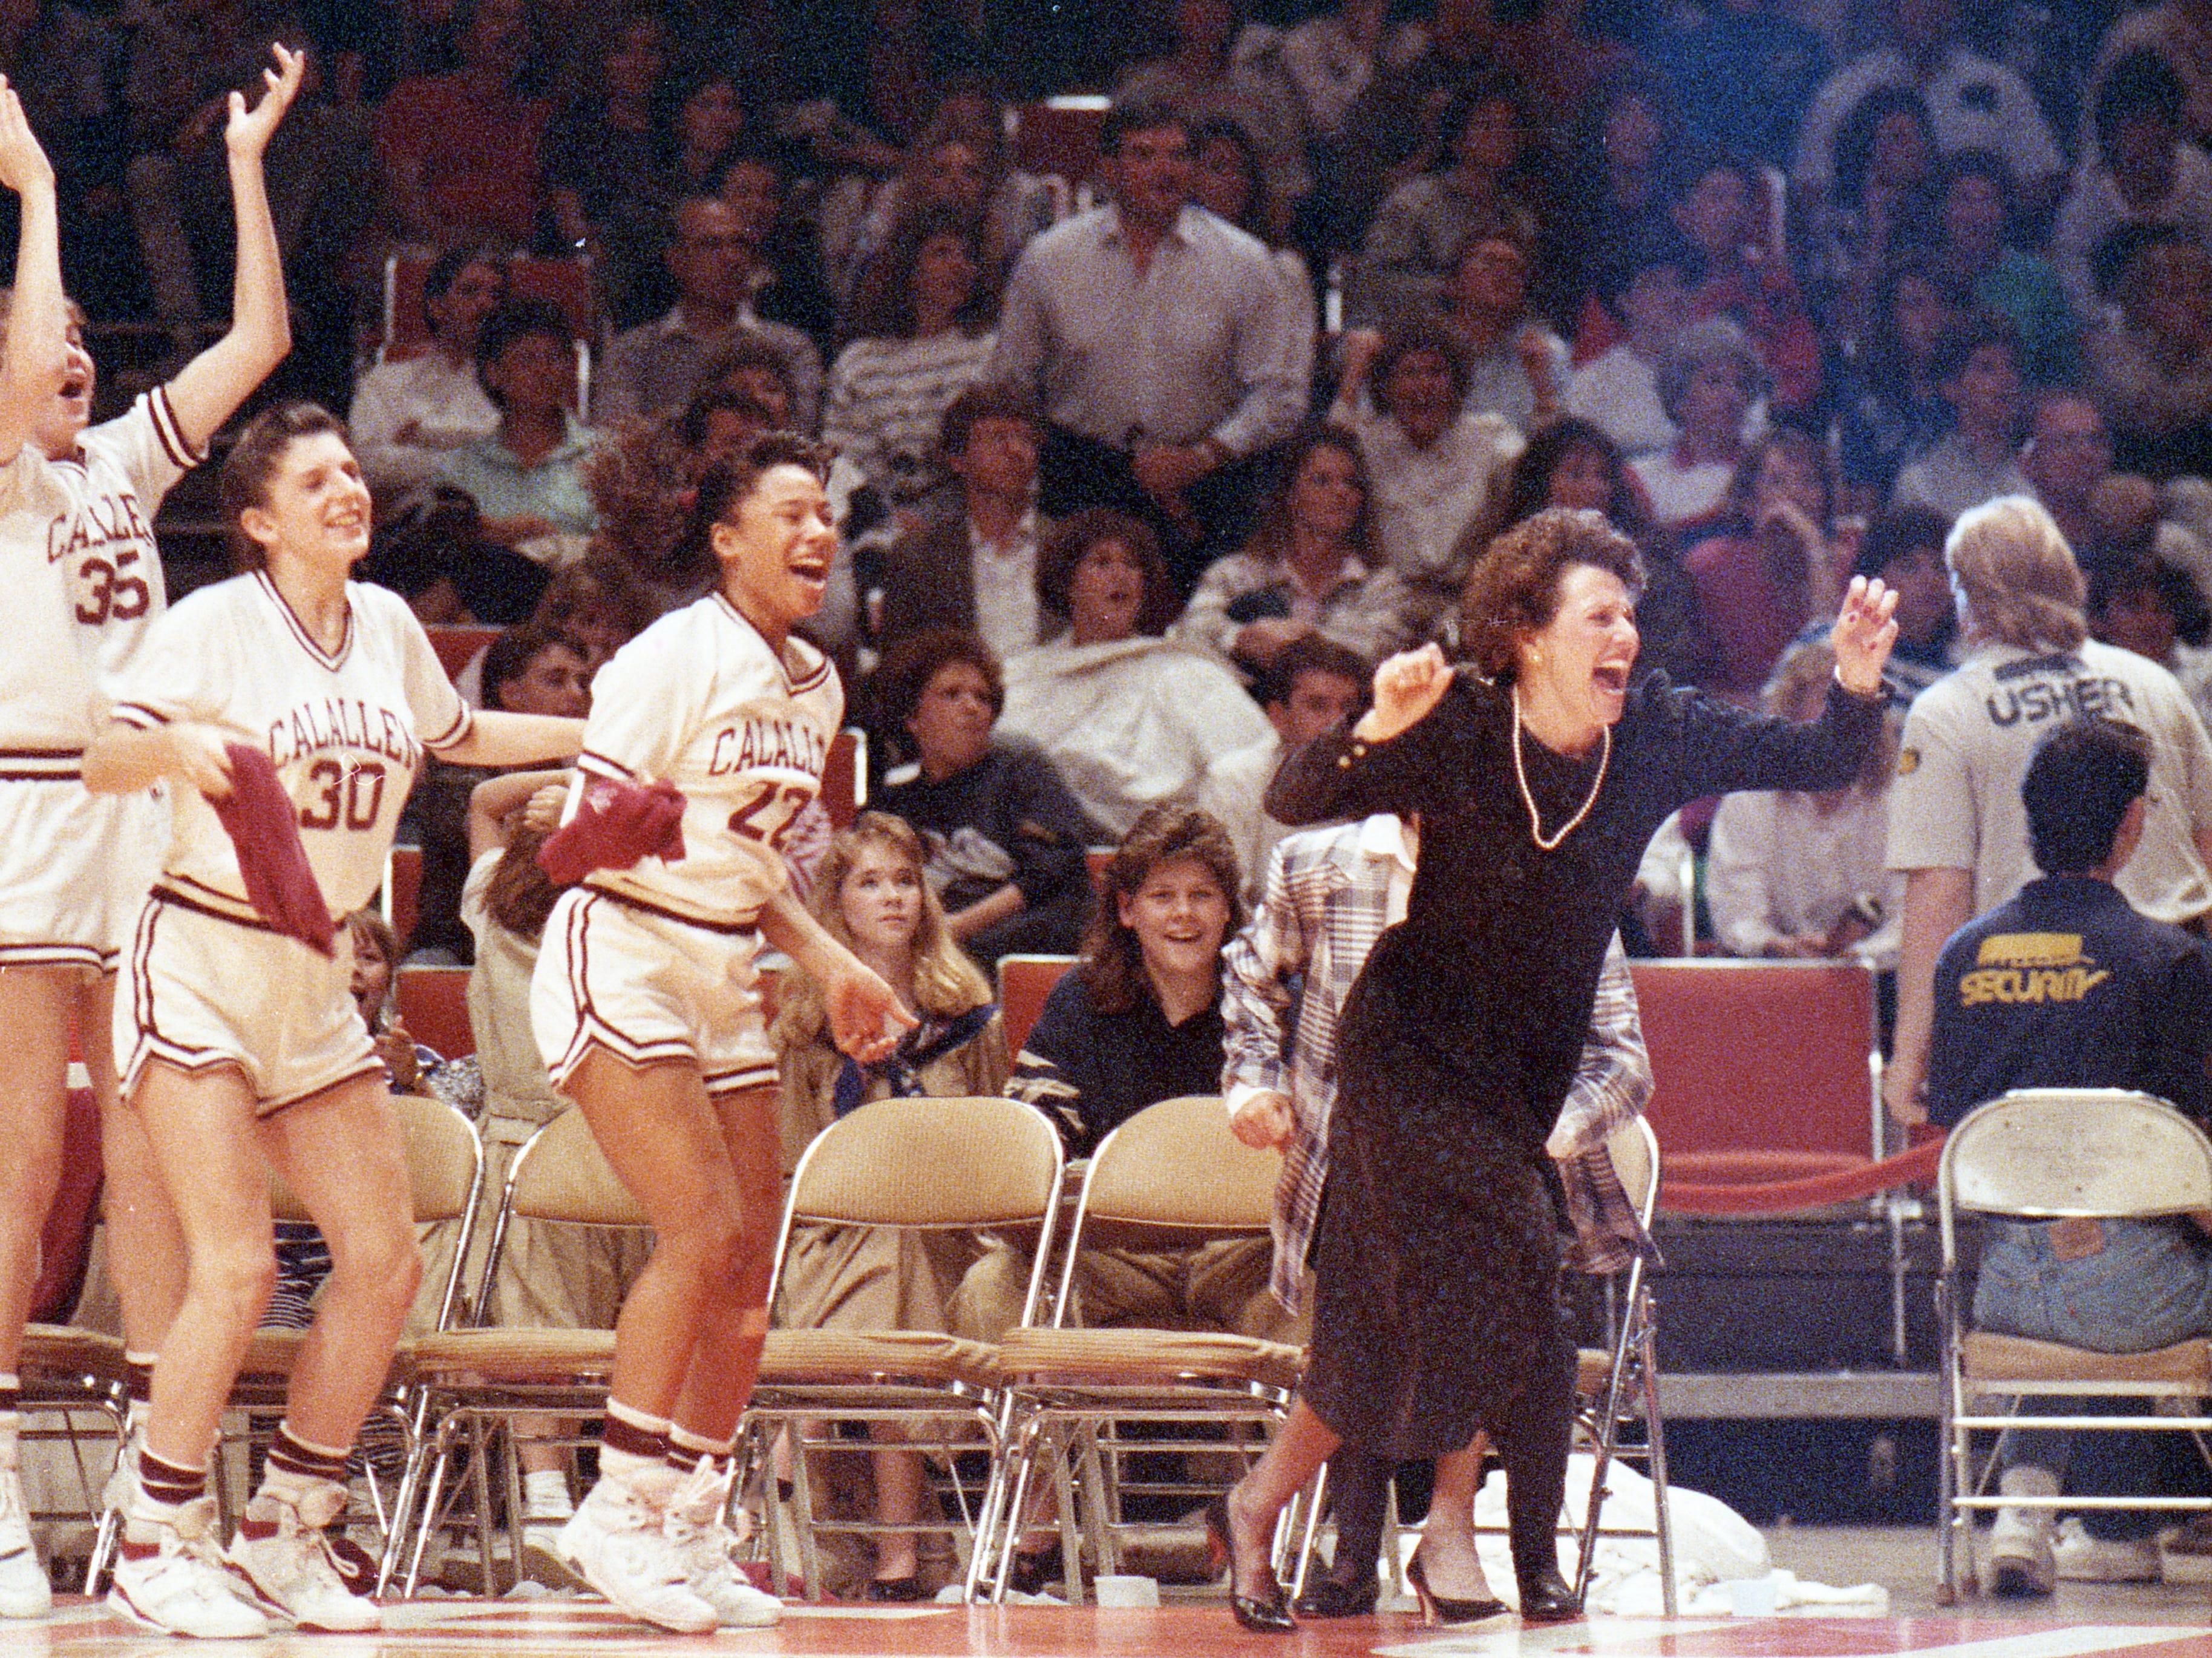 Calallen girls state basketball championship 1990